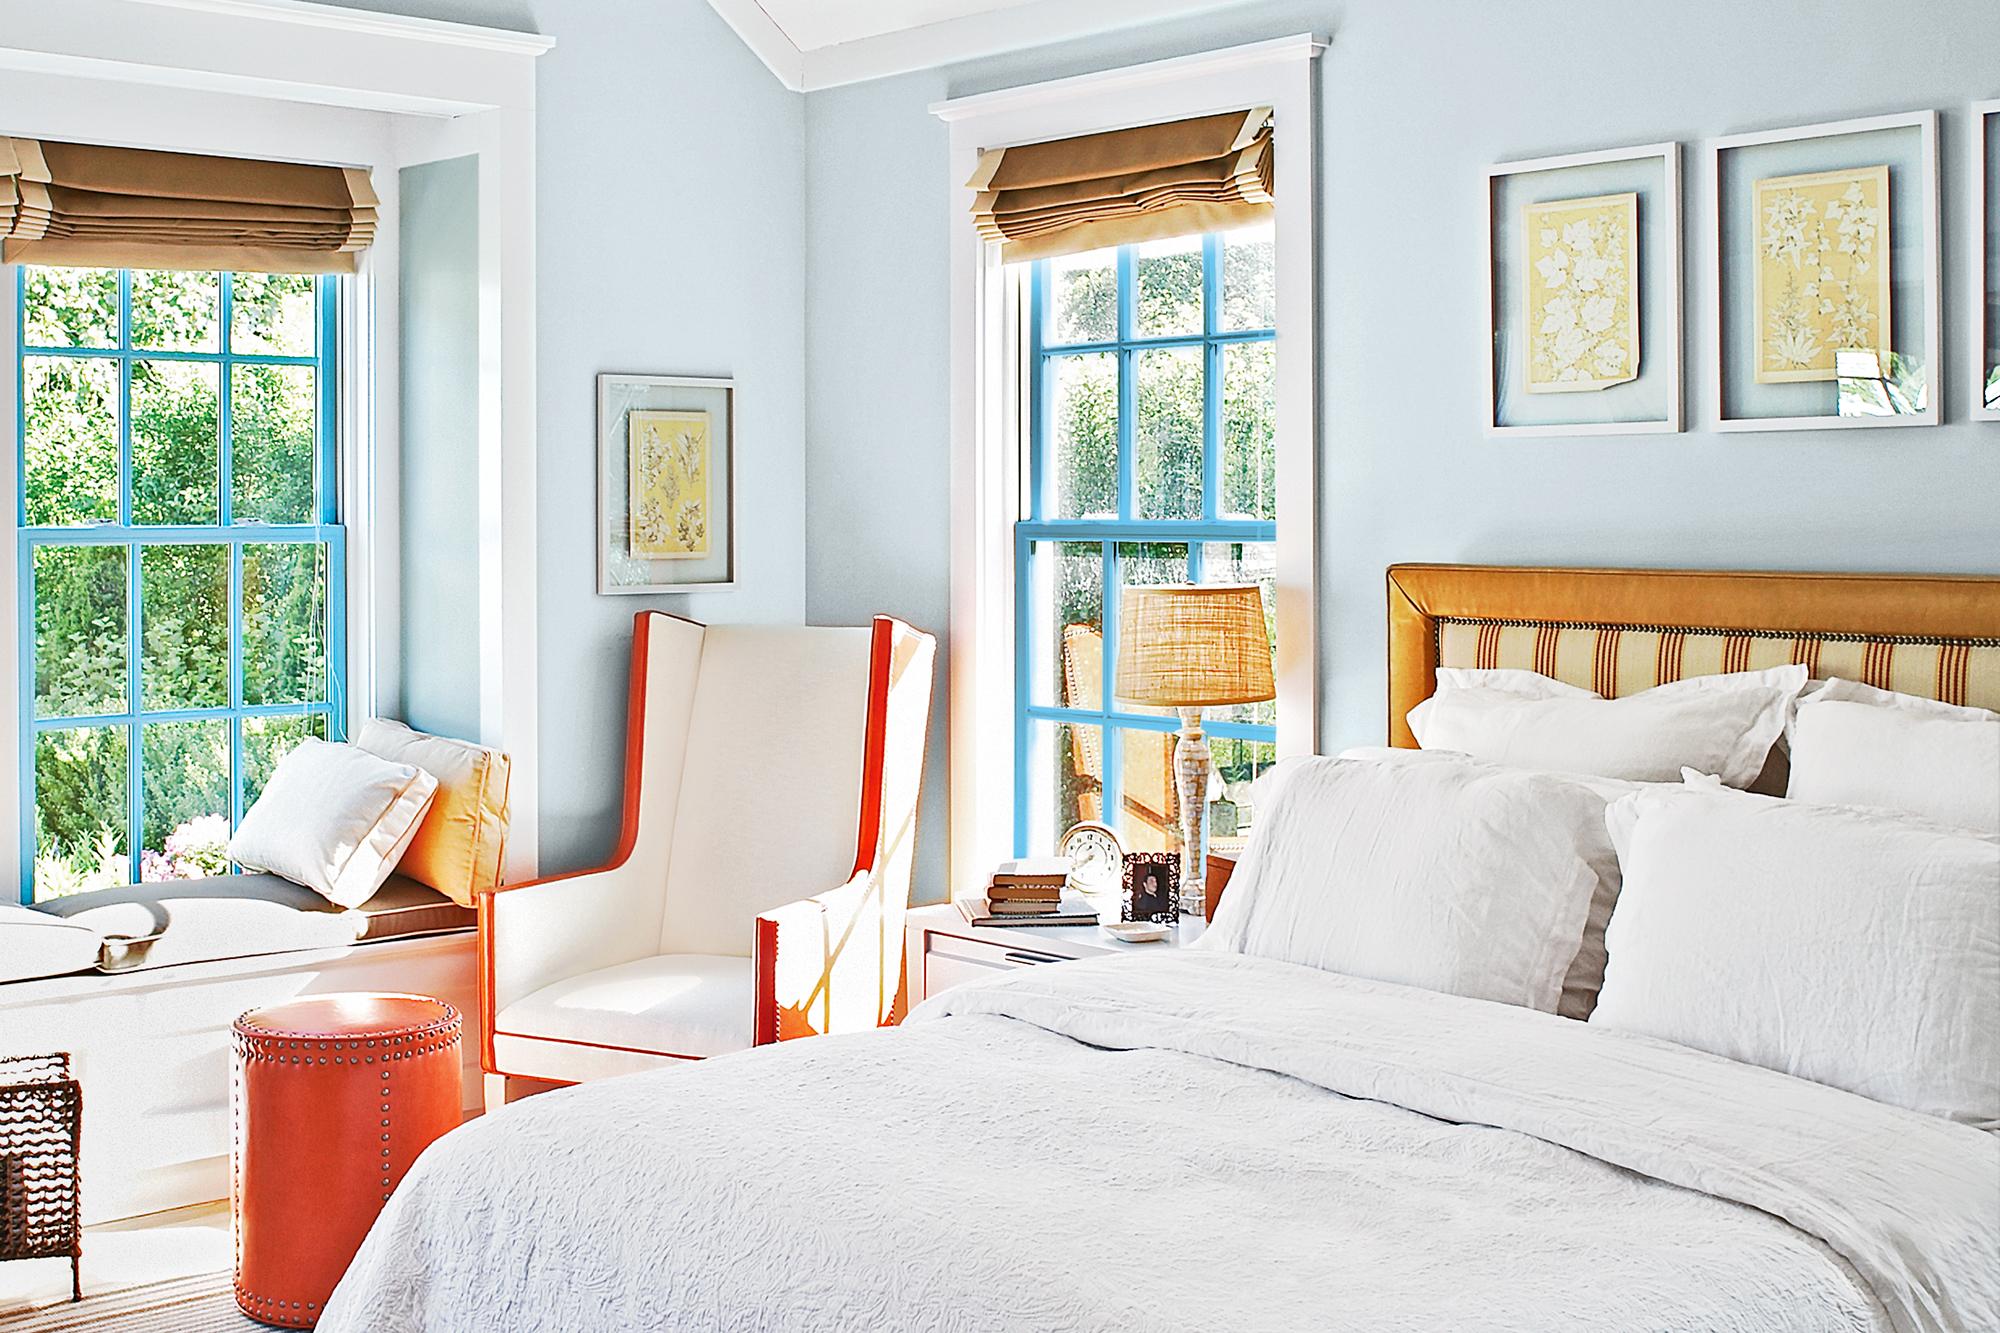 Upholstered Headboard in bright bedroom.